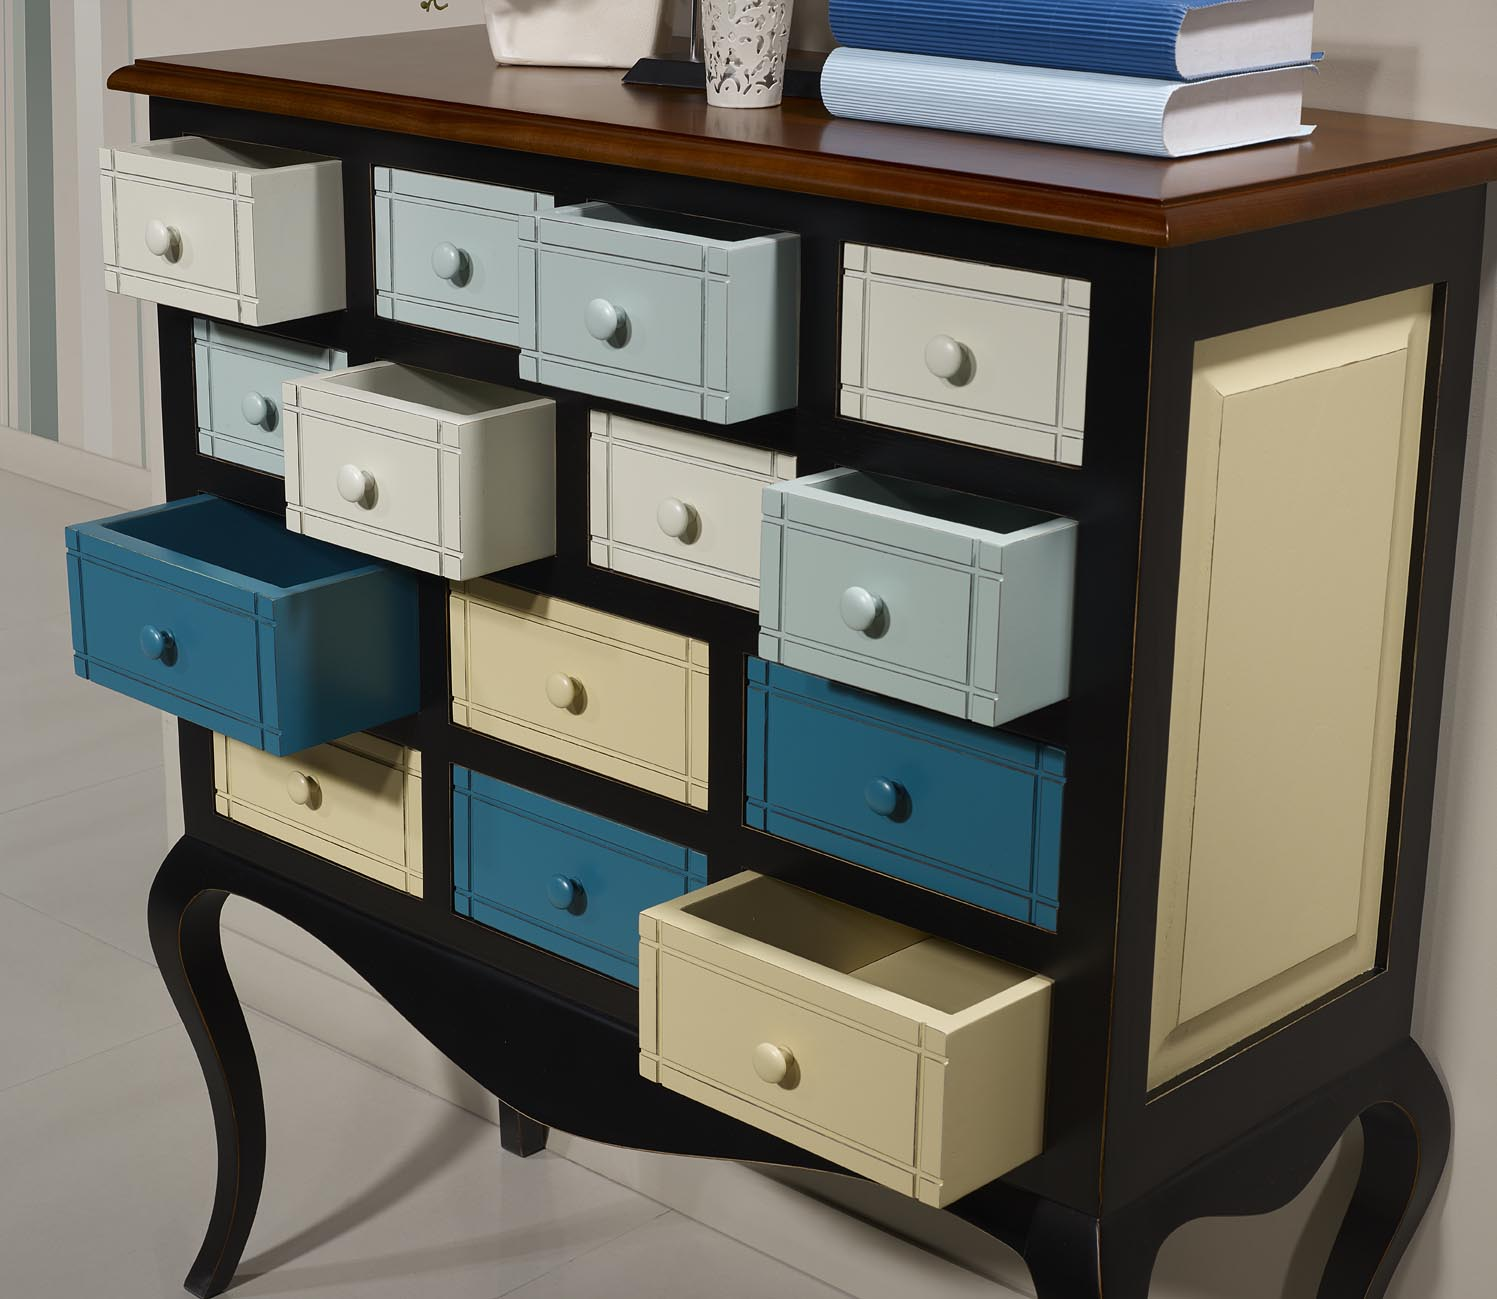 commode ou meuble d 39 entr e selena en merisier et chataignier multicolore meuble en merisier massif. Black Bedroom Furniture Sets. Home Design Ideas